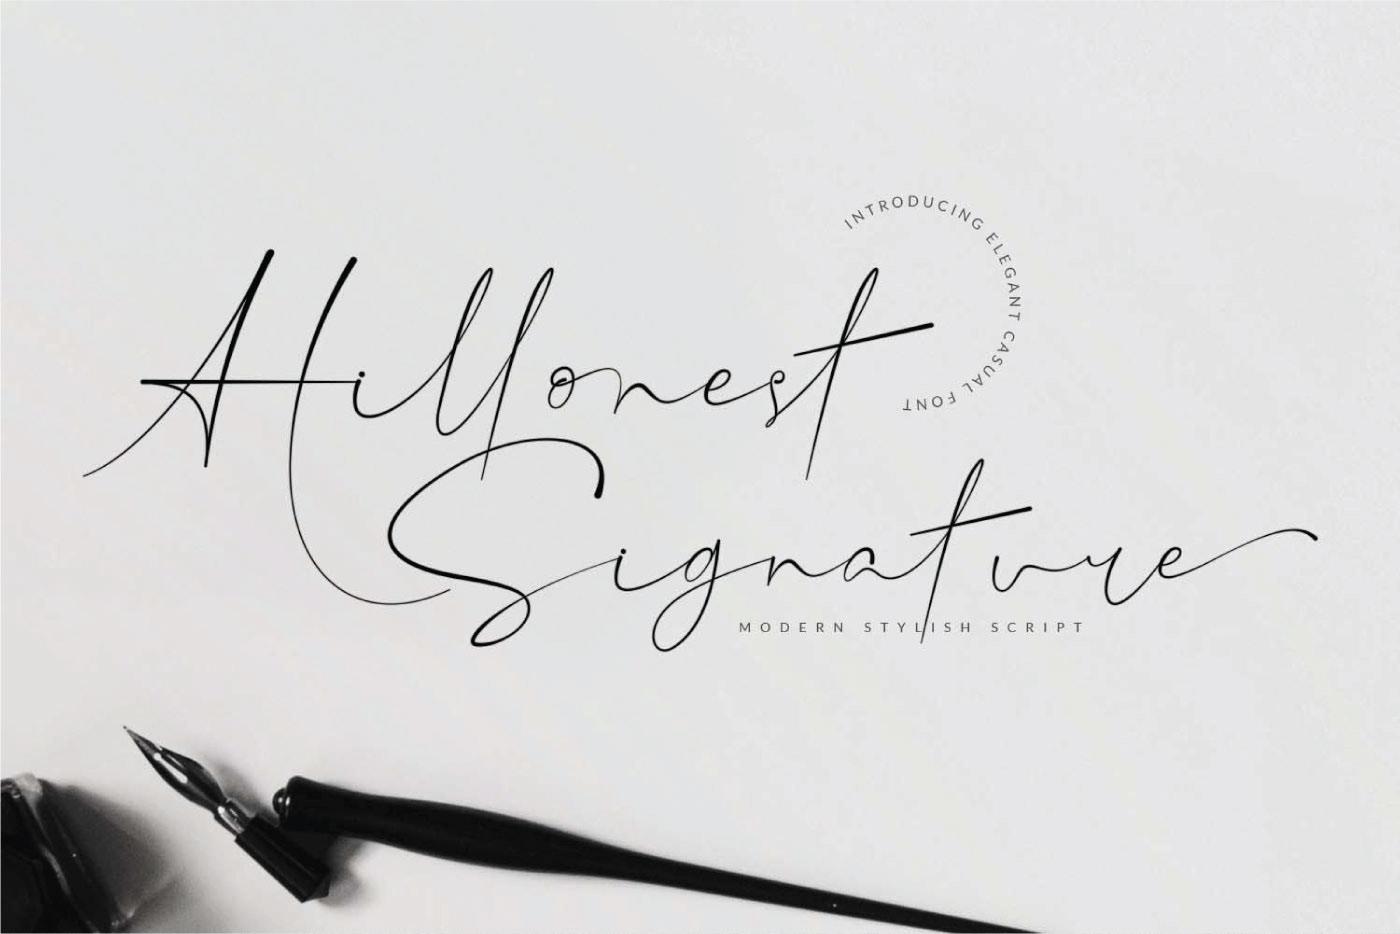 Hillonest Free Font - script